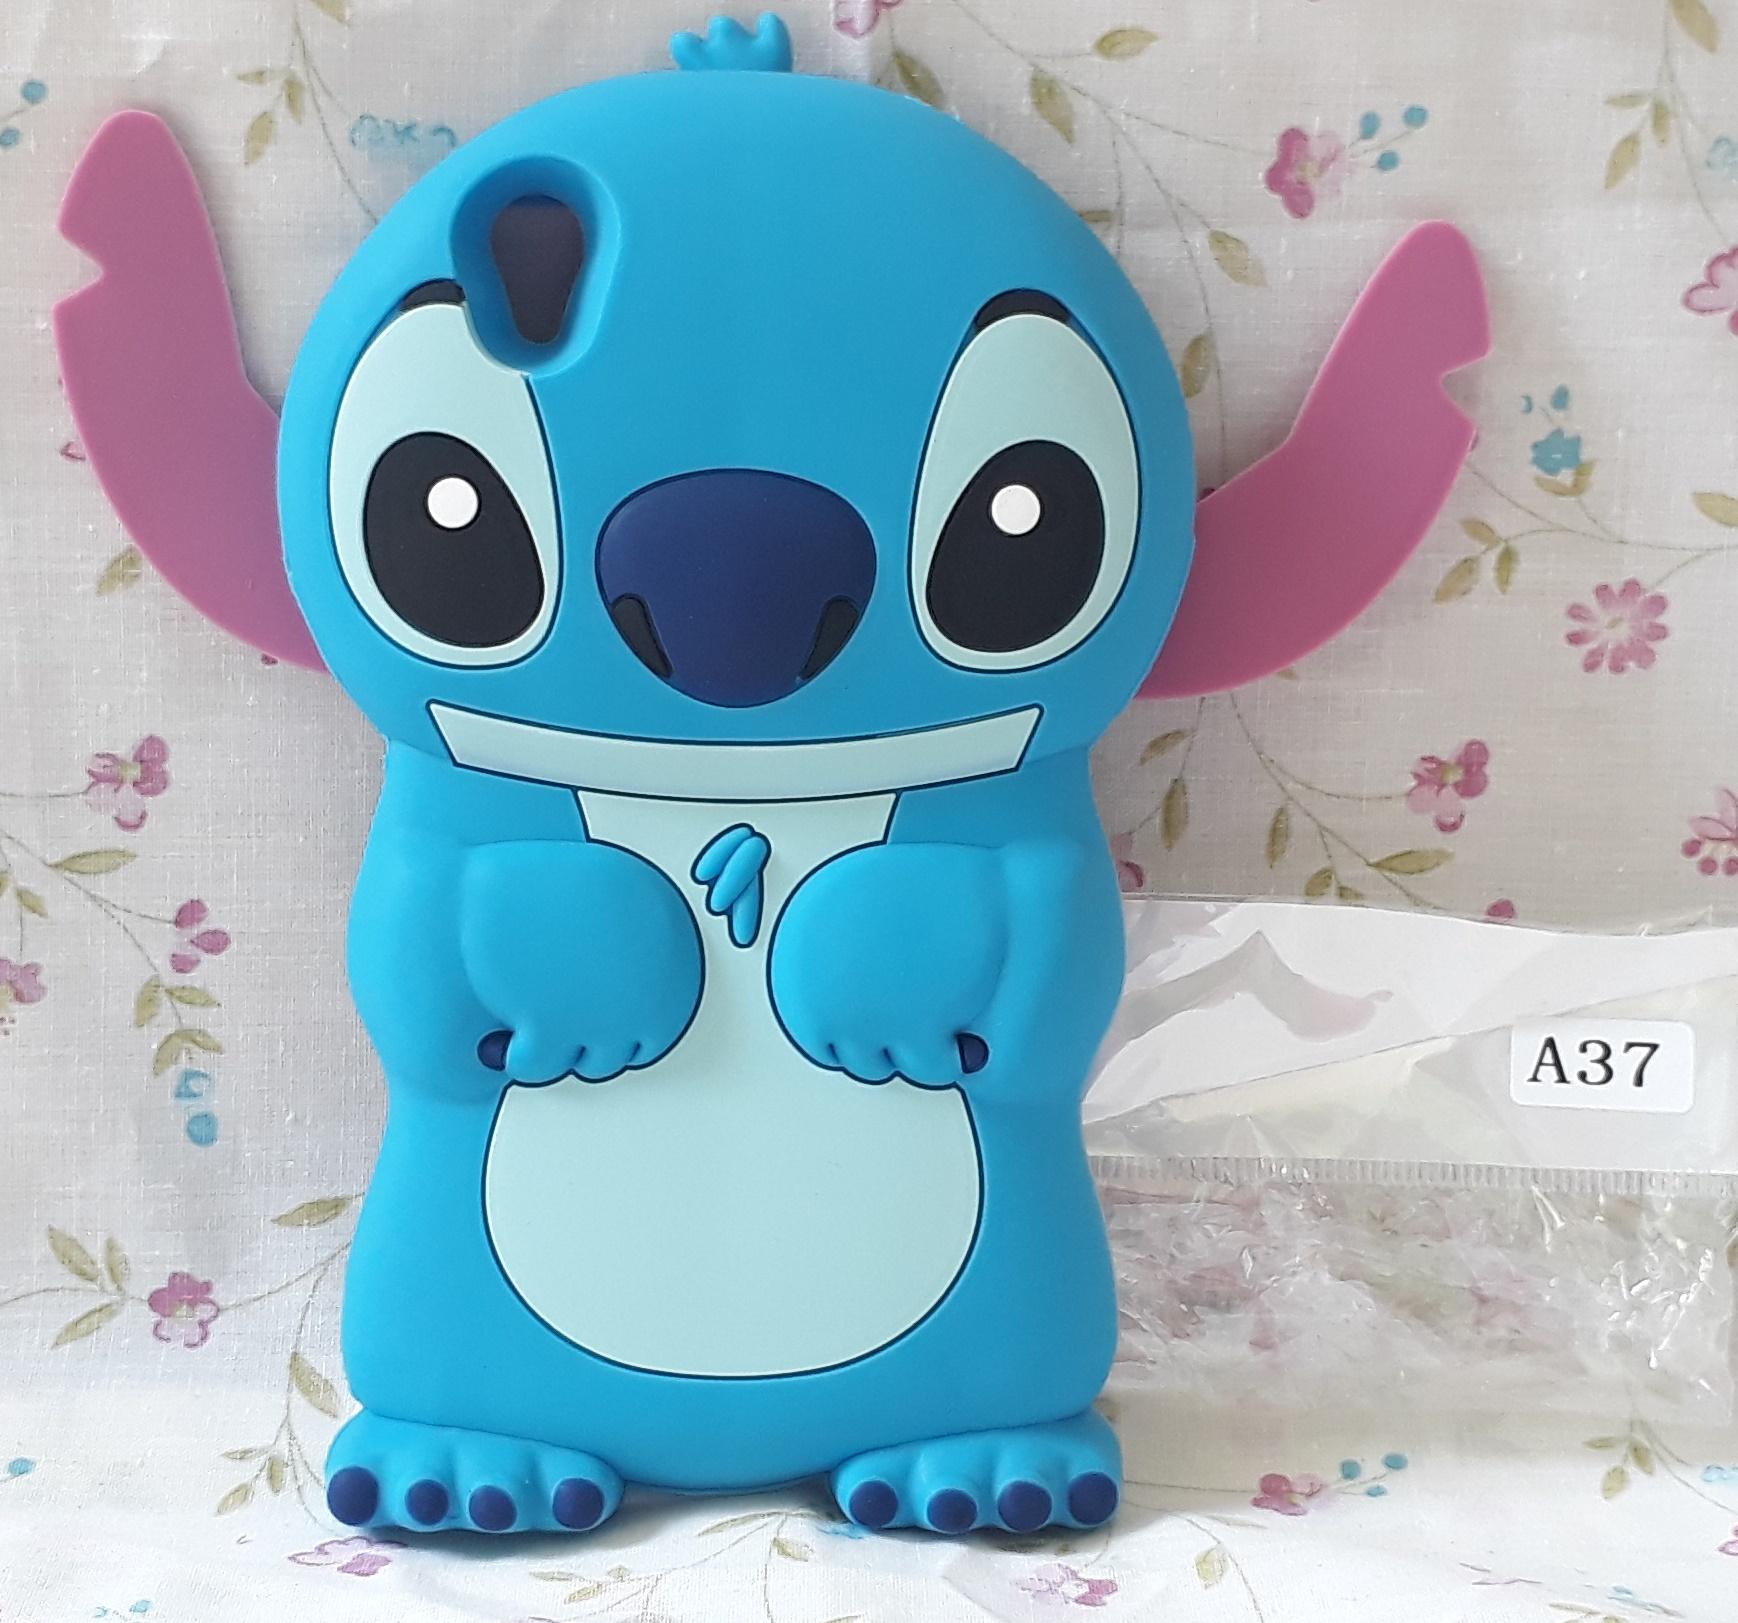 Jual Case 4d Stitch Oppo Neo 9 A37 Karakter Lilo Ear Softcase Tambahan Bubble Soft 3d Nyatacell Tokopedia